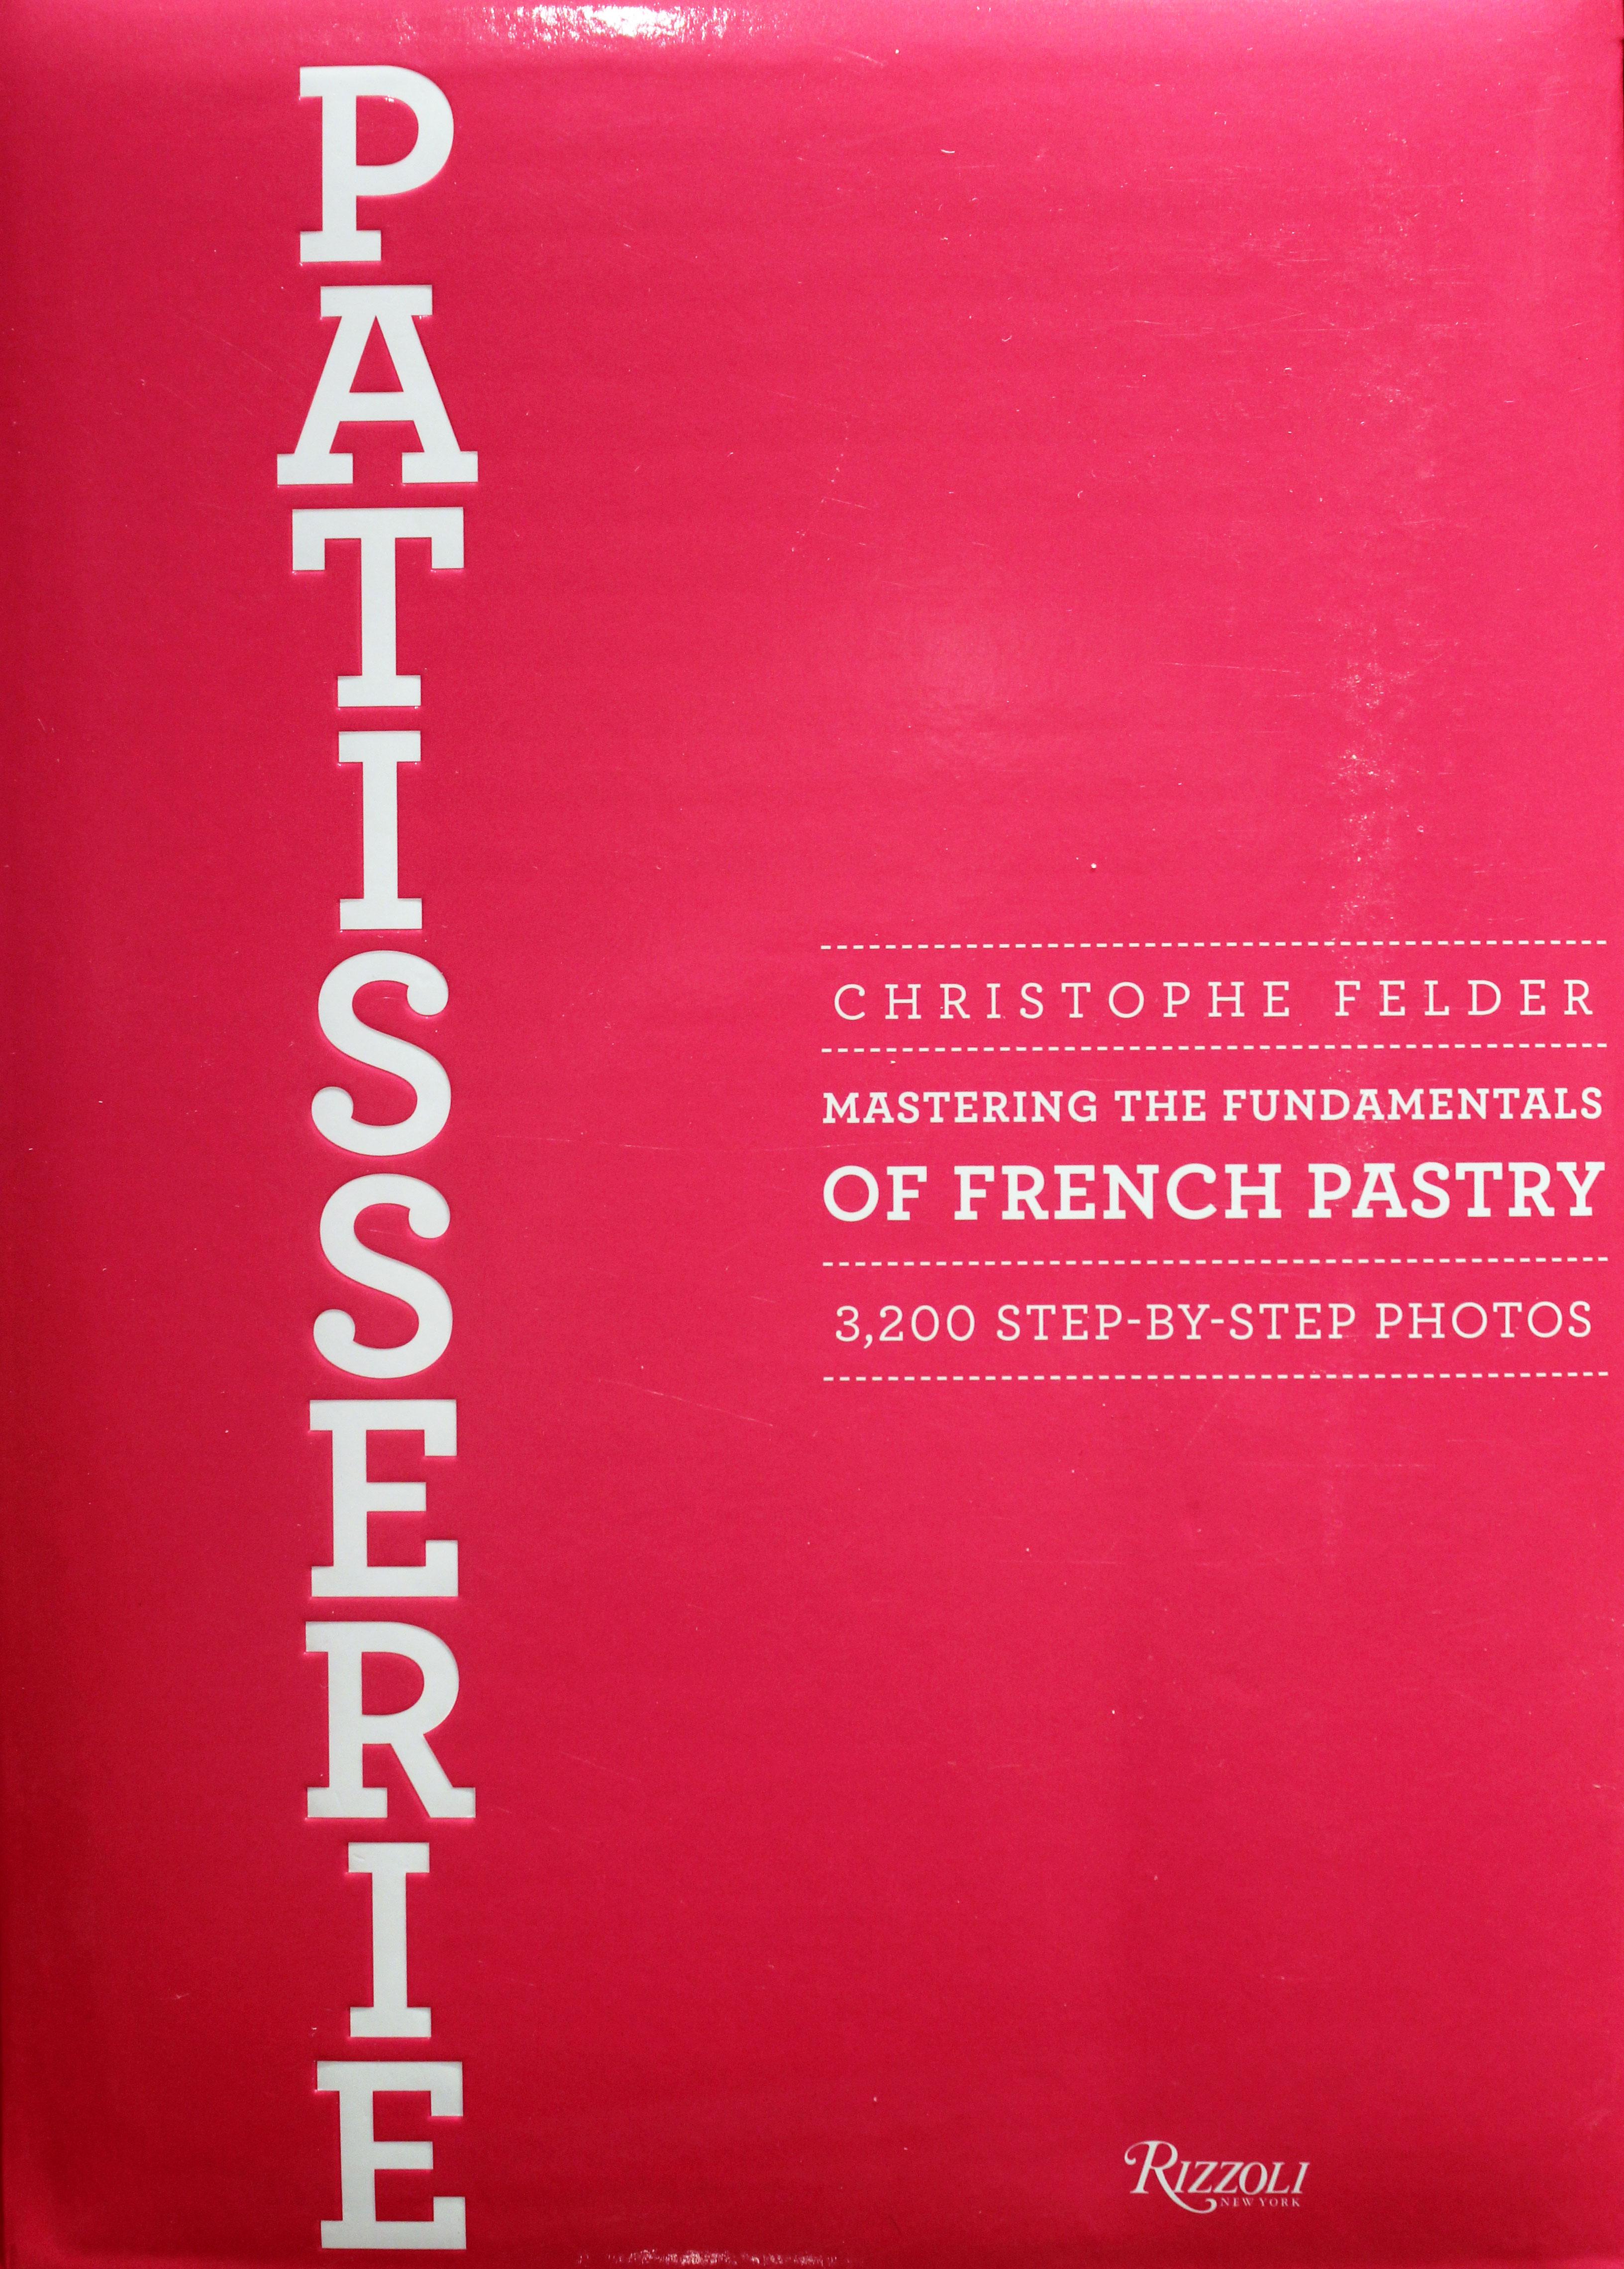 TBT Cookbook Review: Patisserie by Christophe Felder